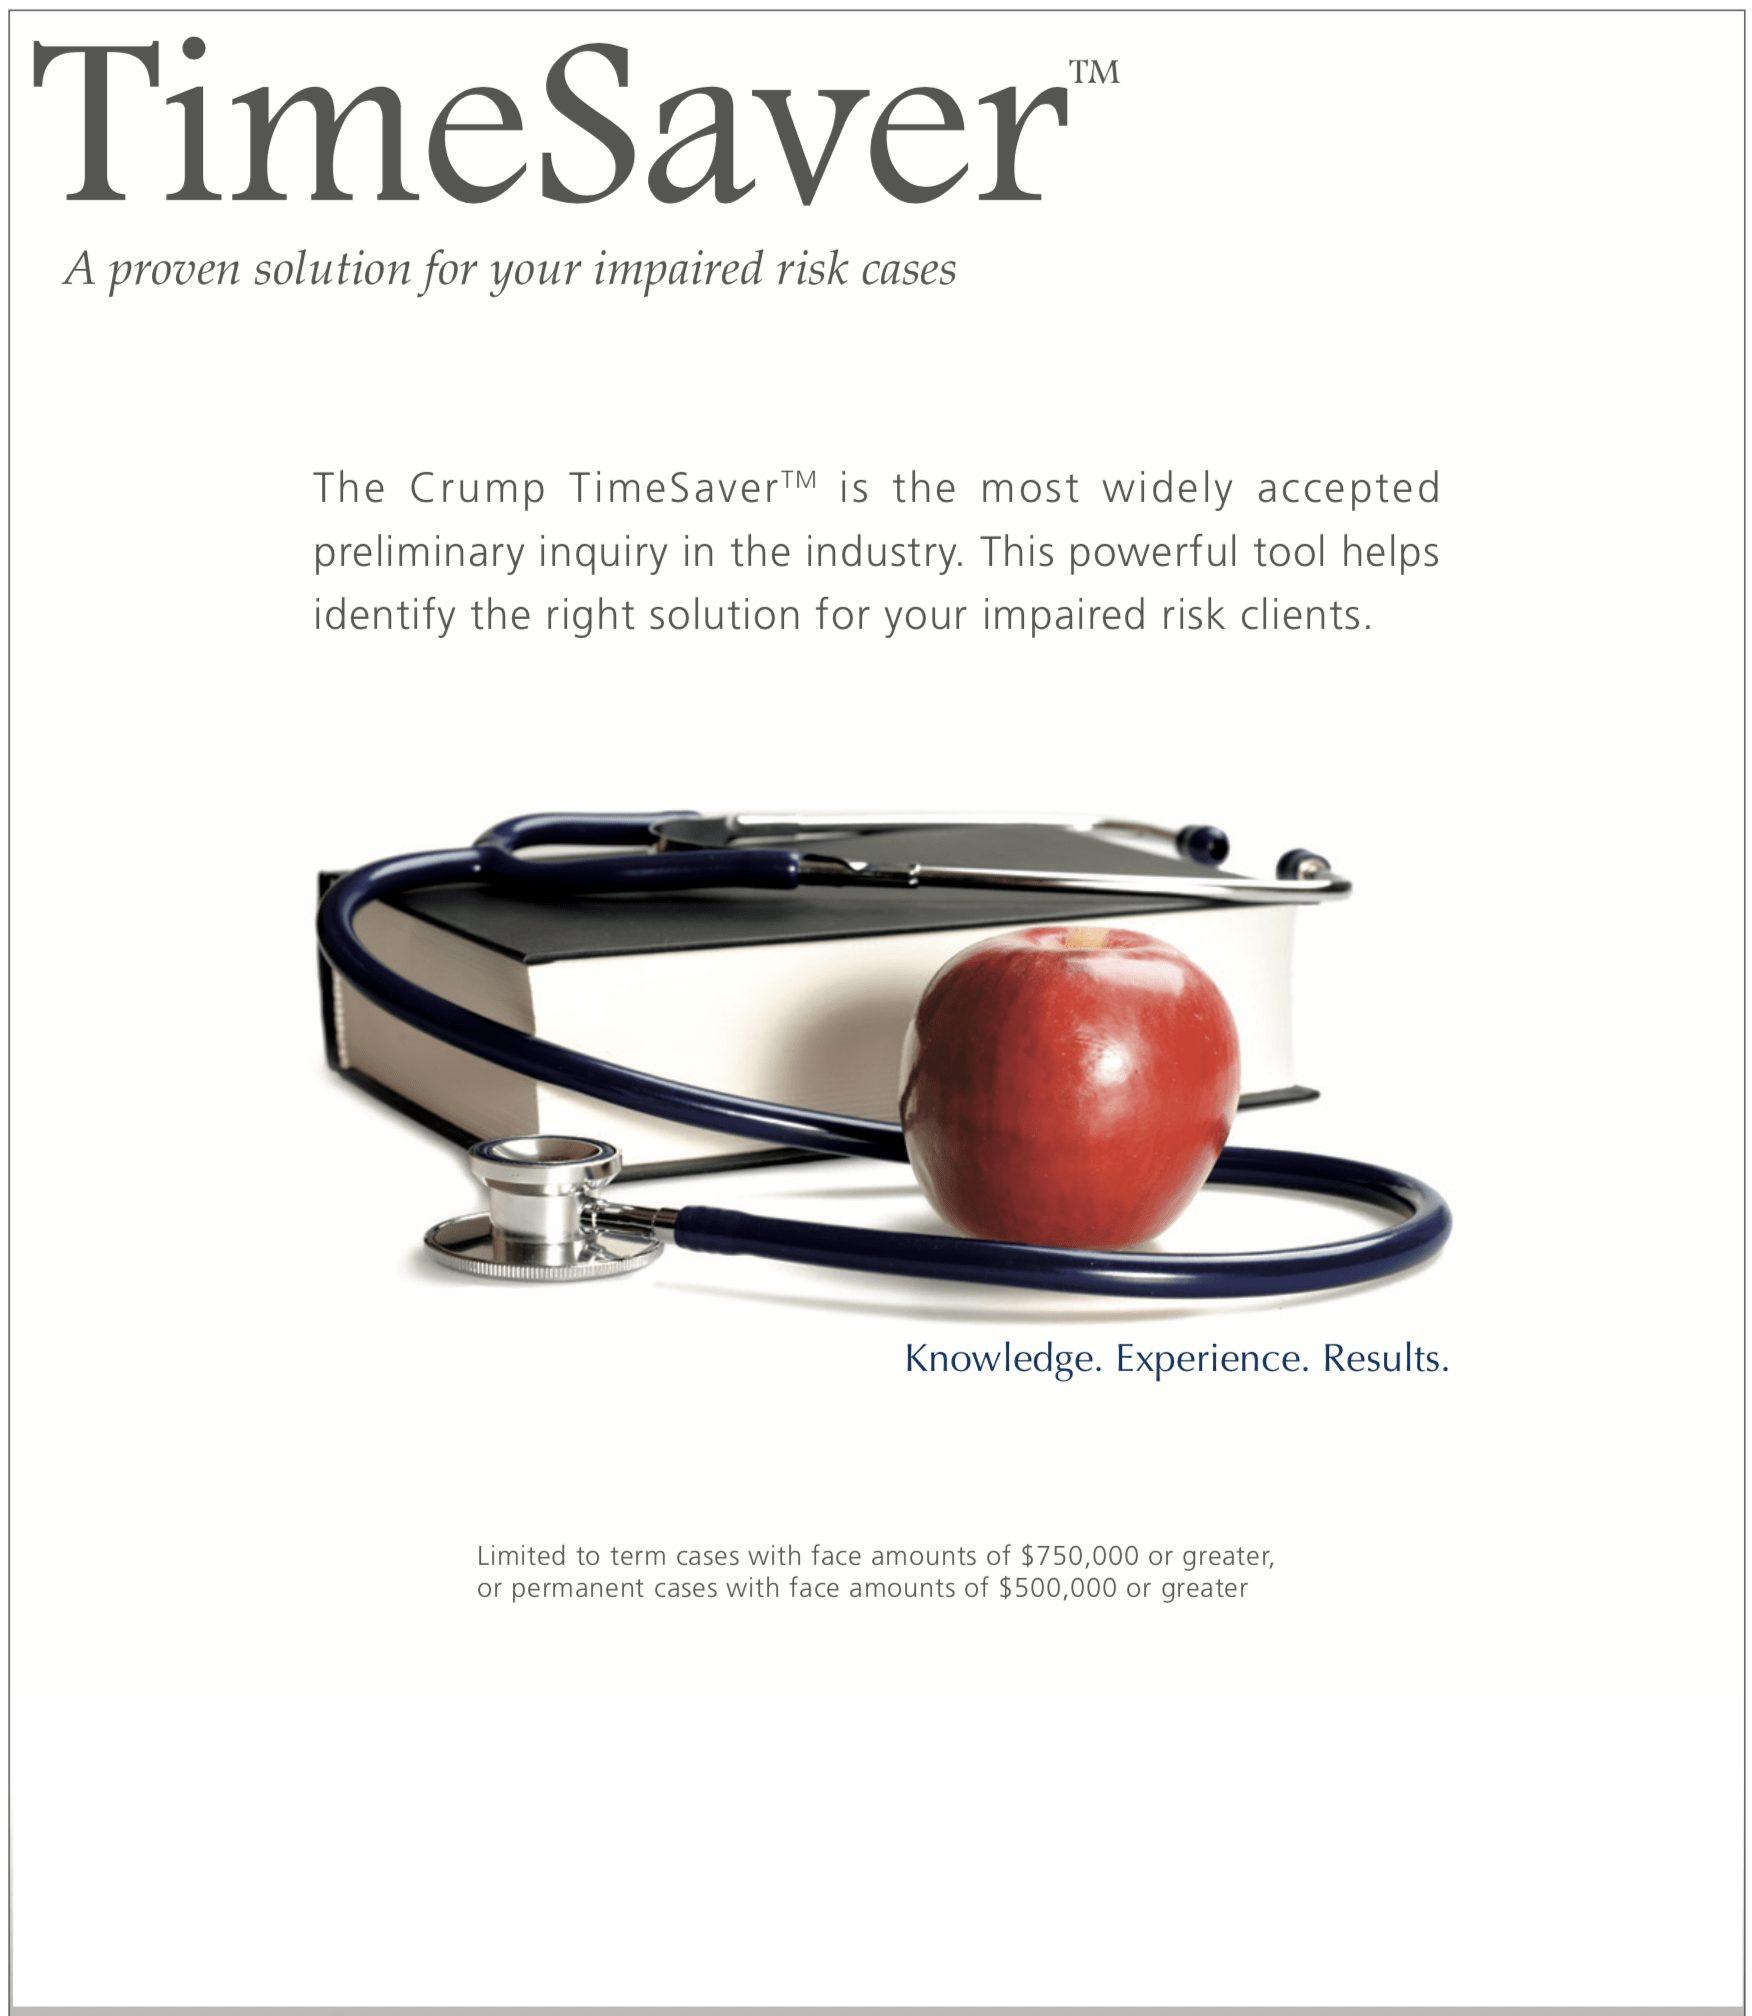 hiv timesaver